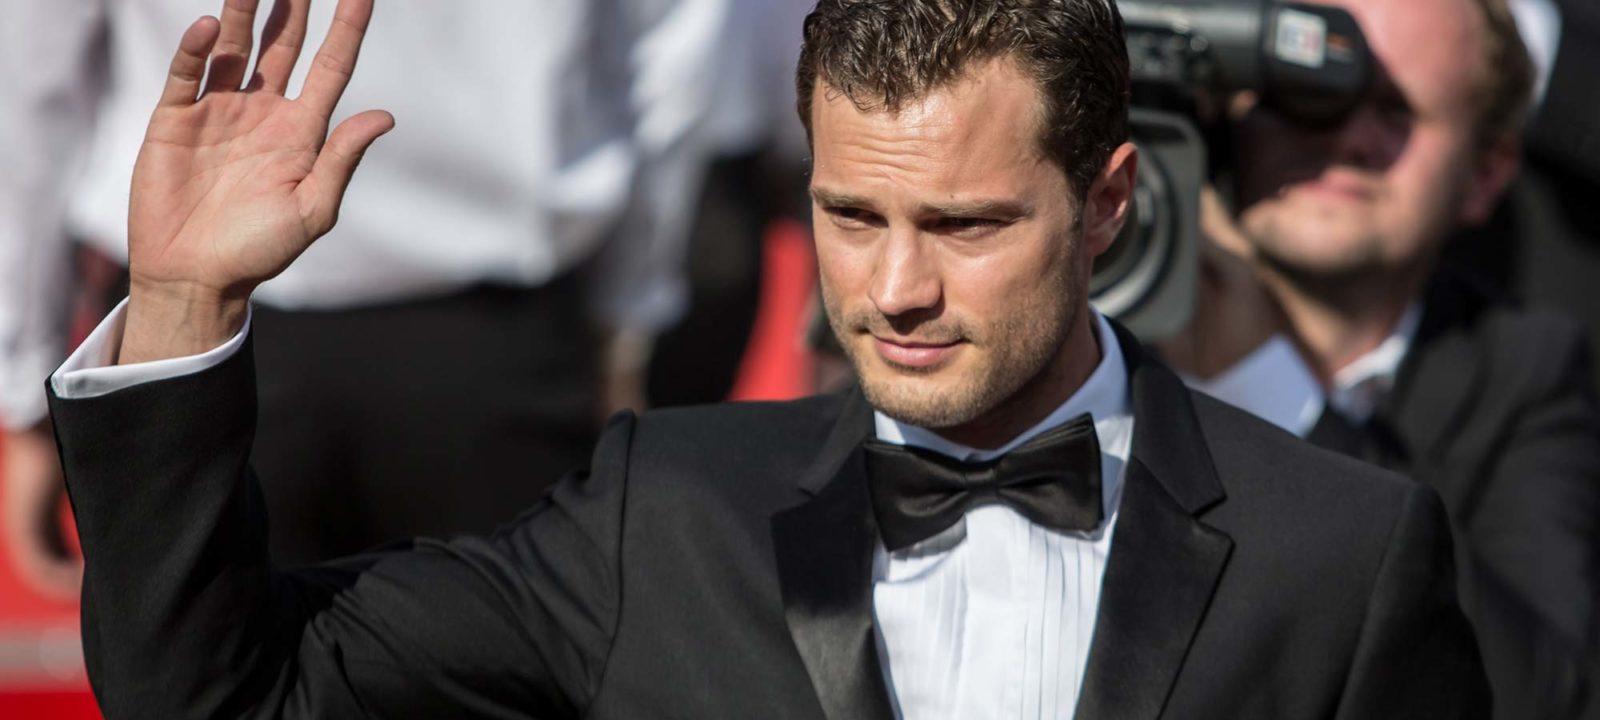 MORE: Jamie Dornan Will Play Christian Grey In '50 Shades Of Grey' foto